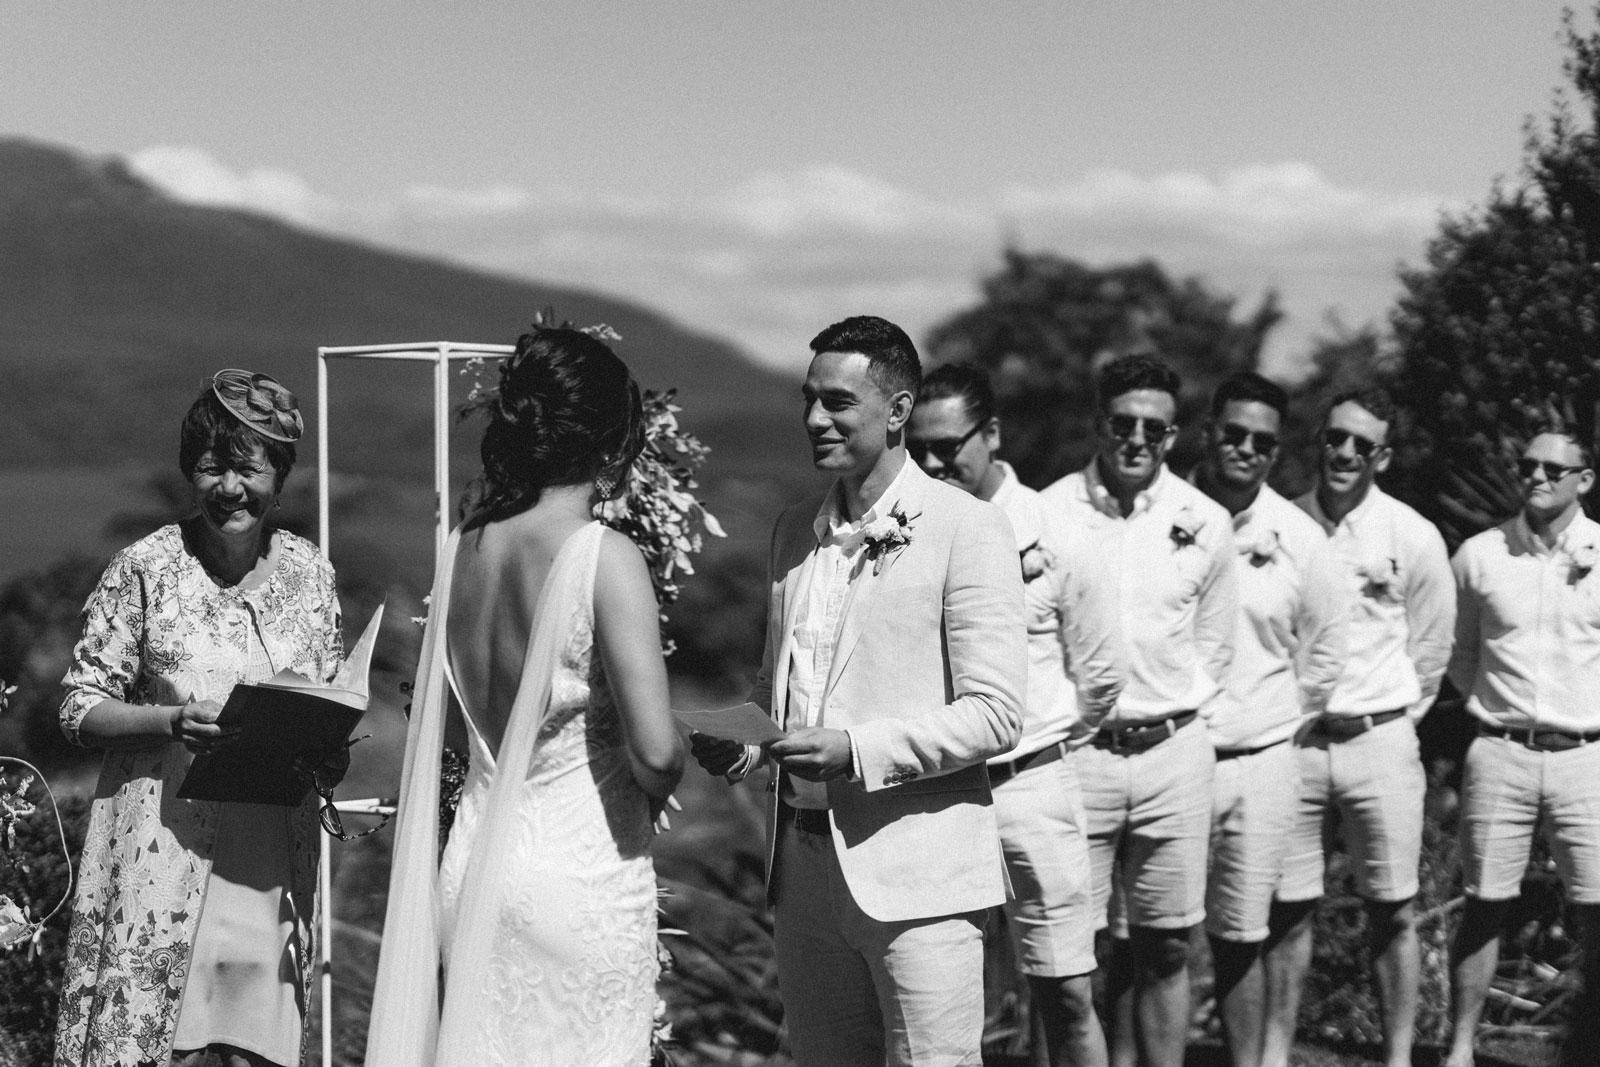 newfound-n-w-black-barn-tarawera-rotorua-wedding-photographer-516A